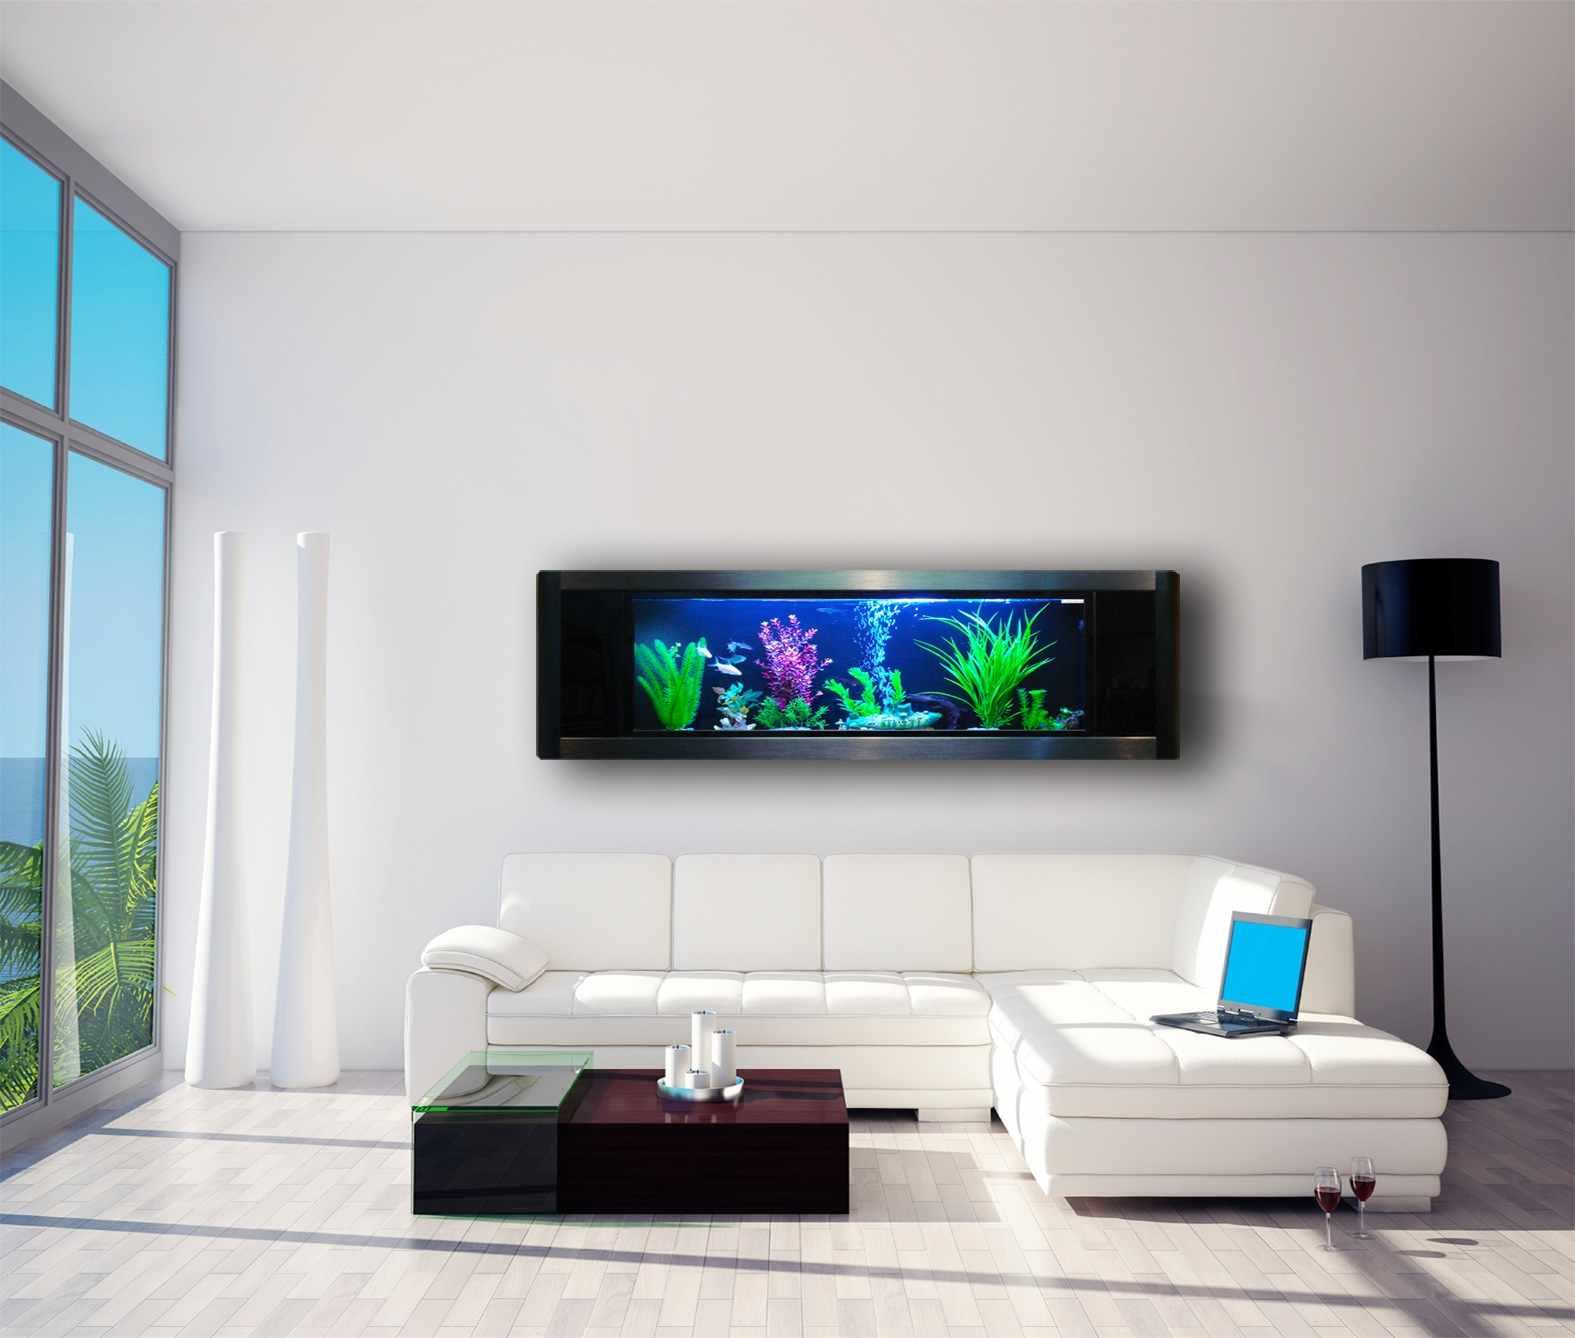 Fish tank in bedroom - Fish Tank In Bedroom